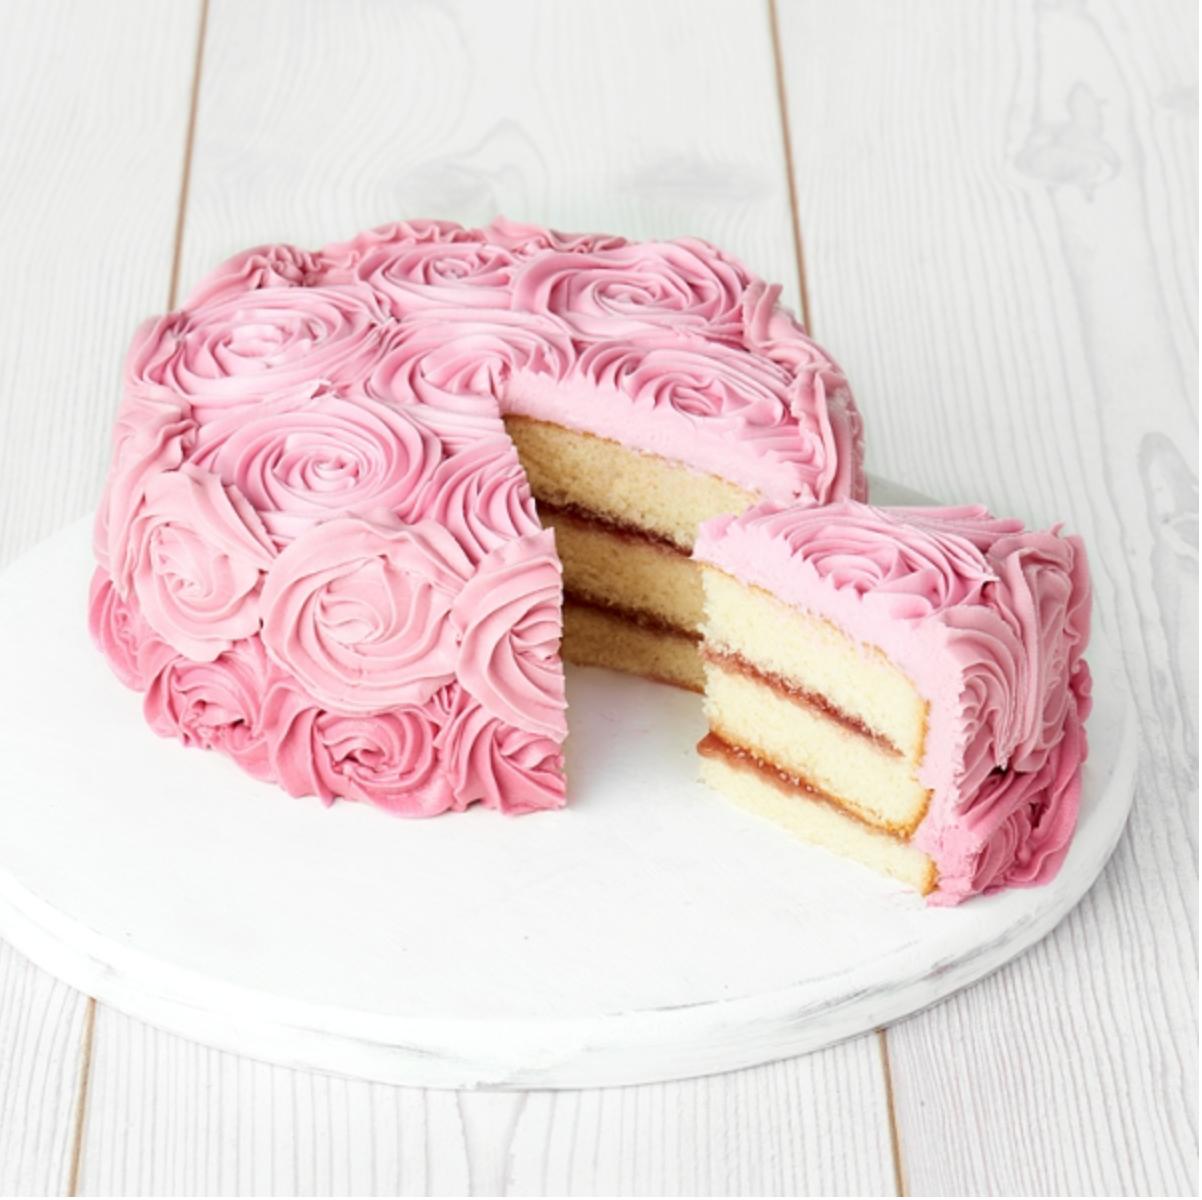 Sainsbury's rose cake